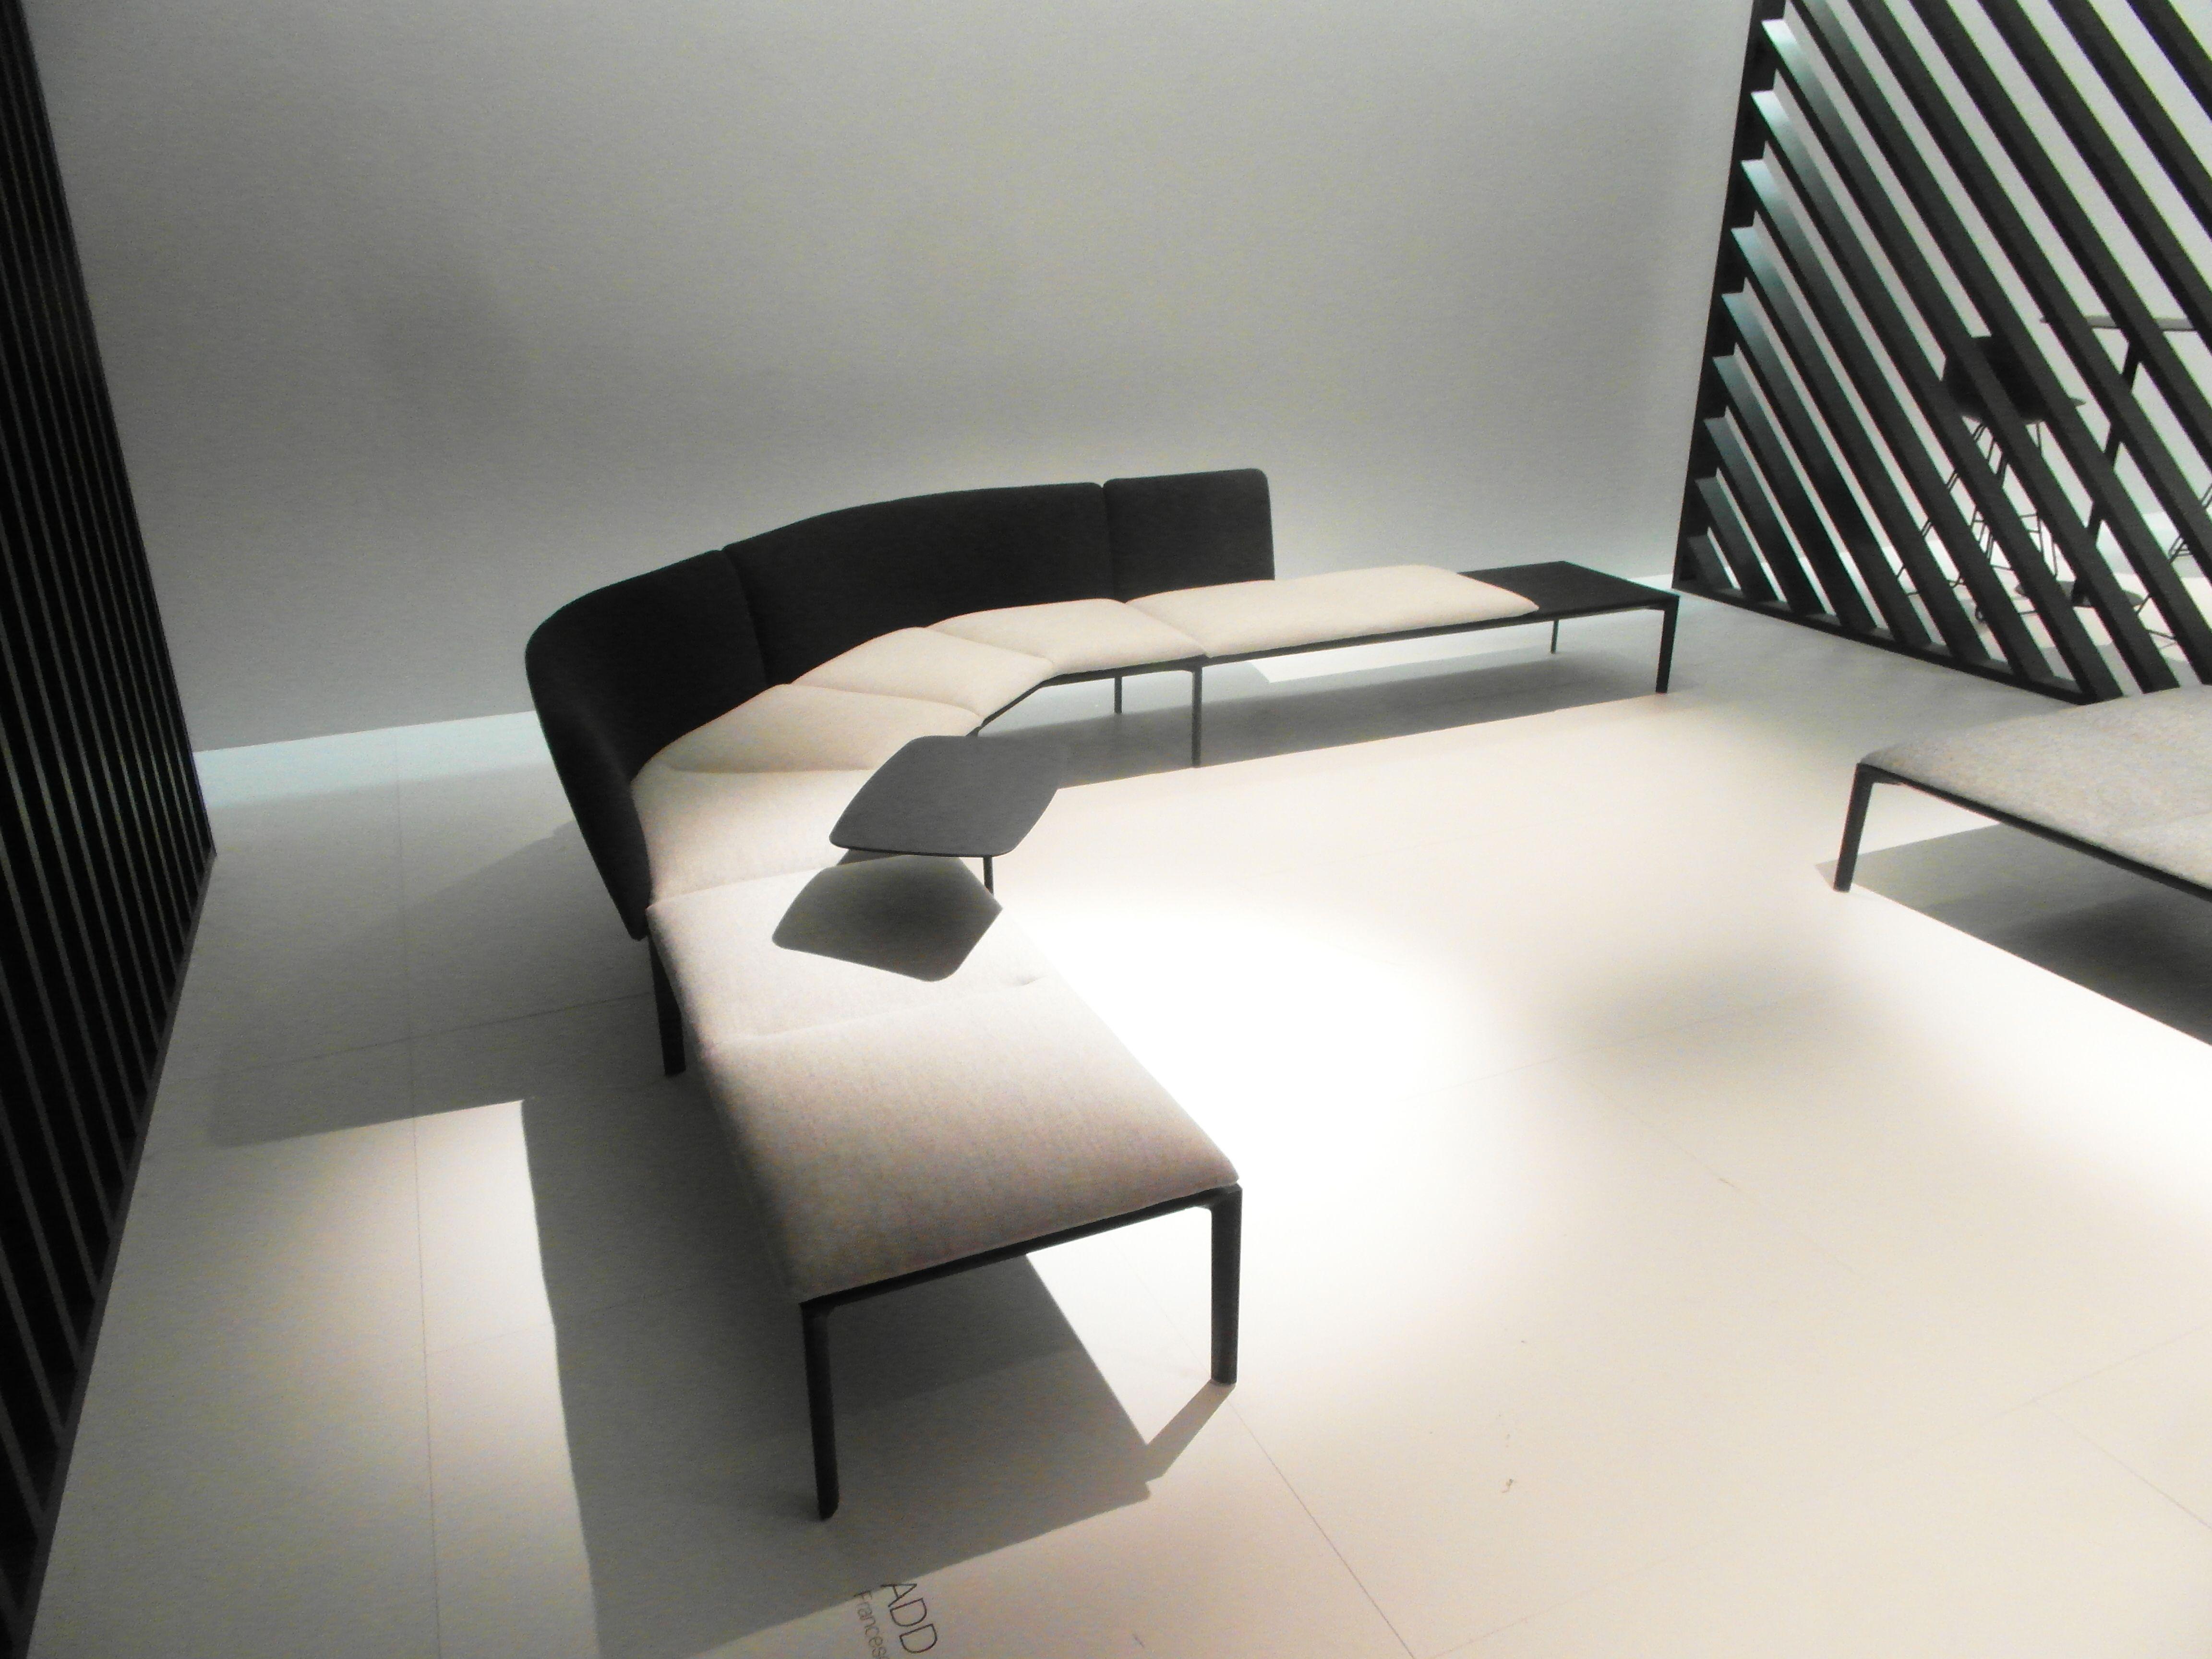 Molinari Sedie ~ Lapalma add http: wkworks.com content add furnish: seating